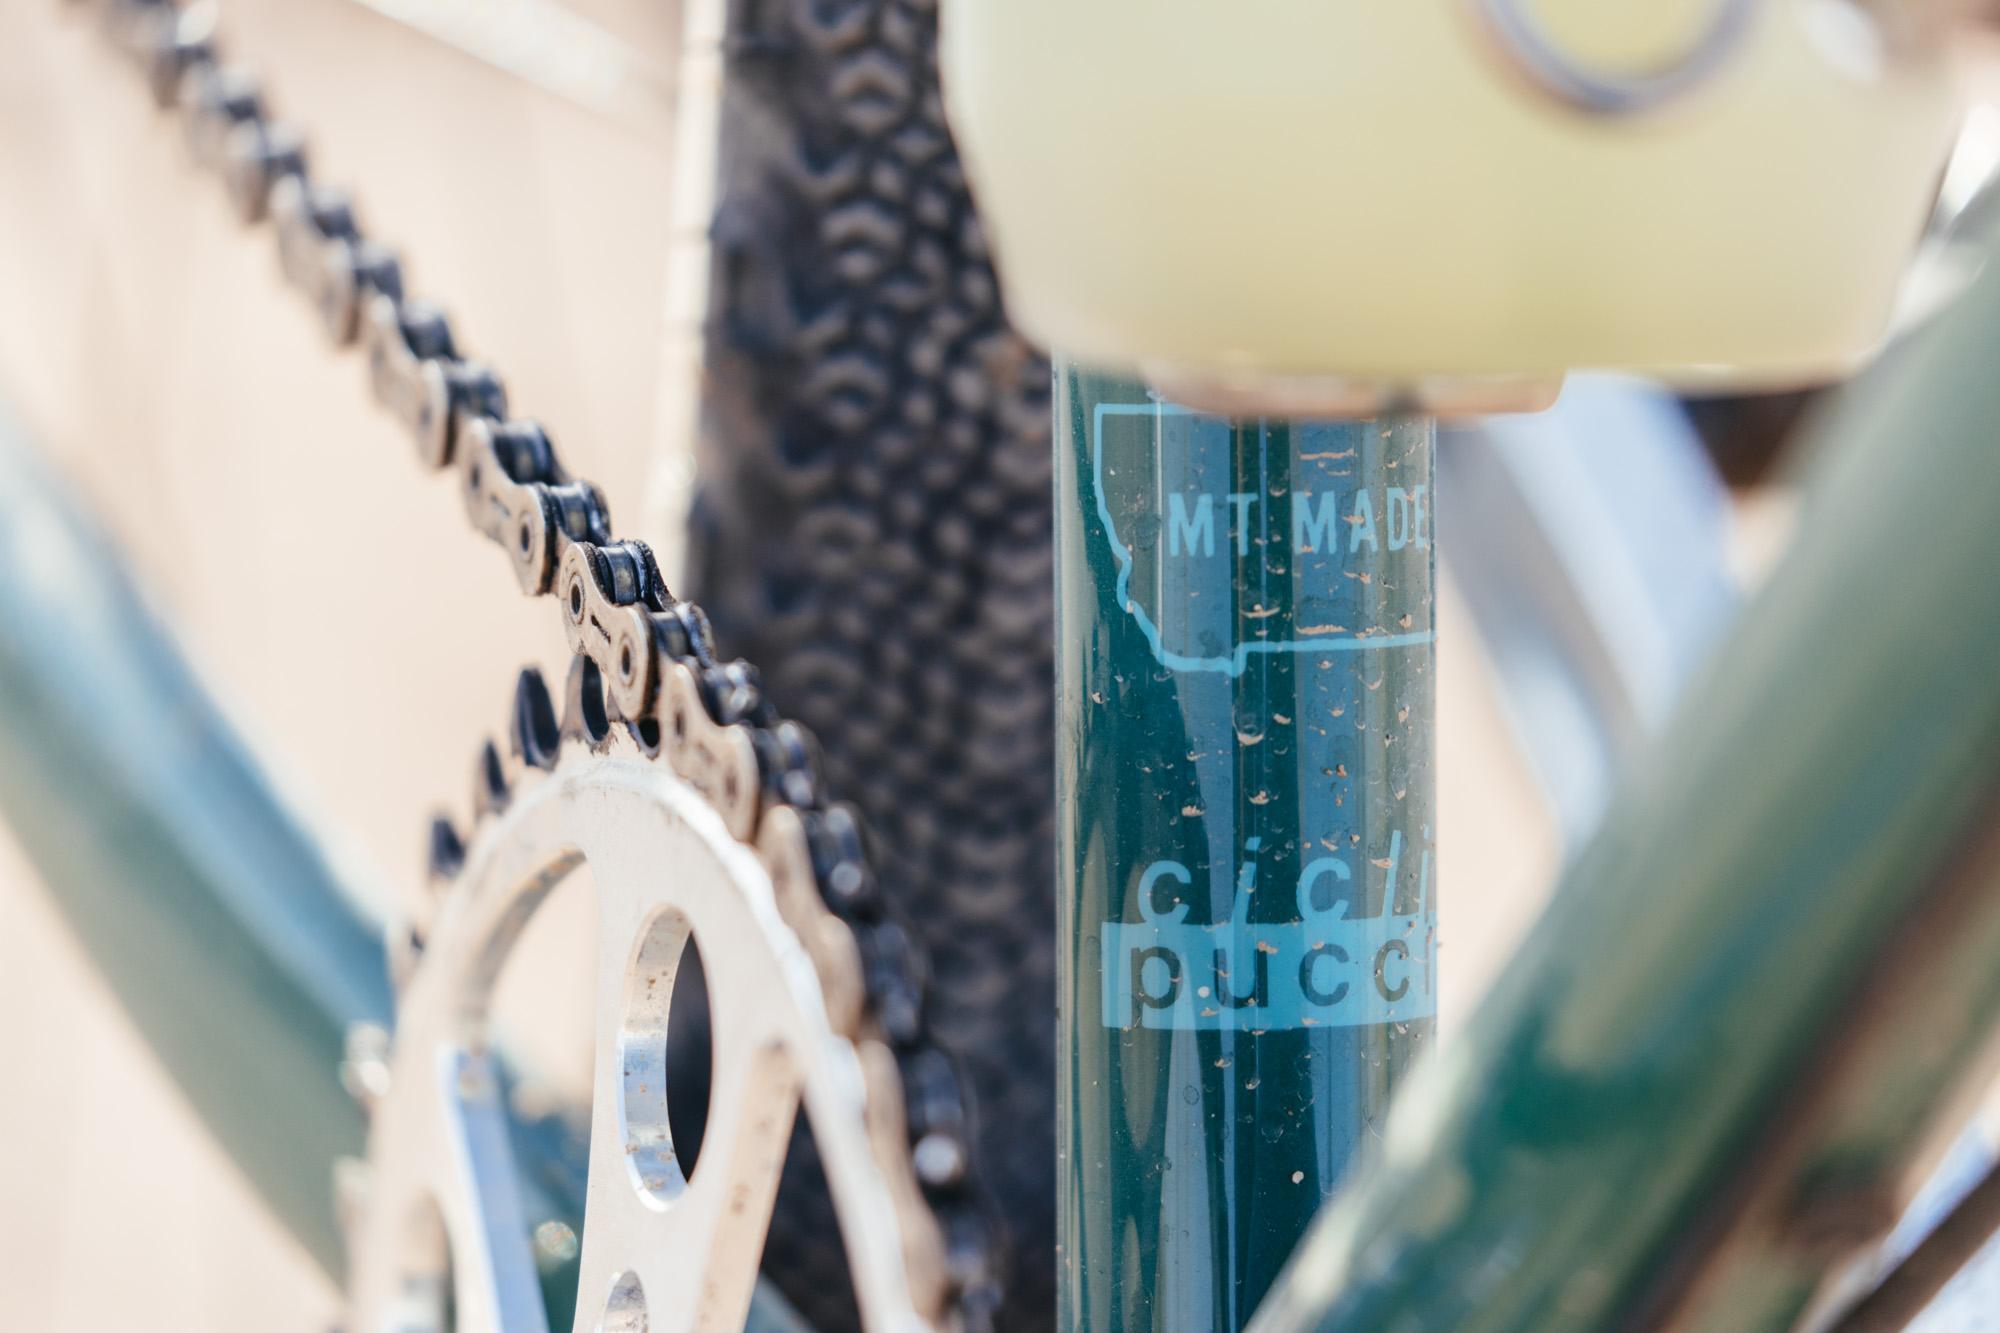 Mason's Pucci Cicli Painted Sklar All Road